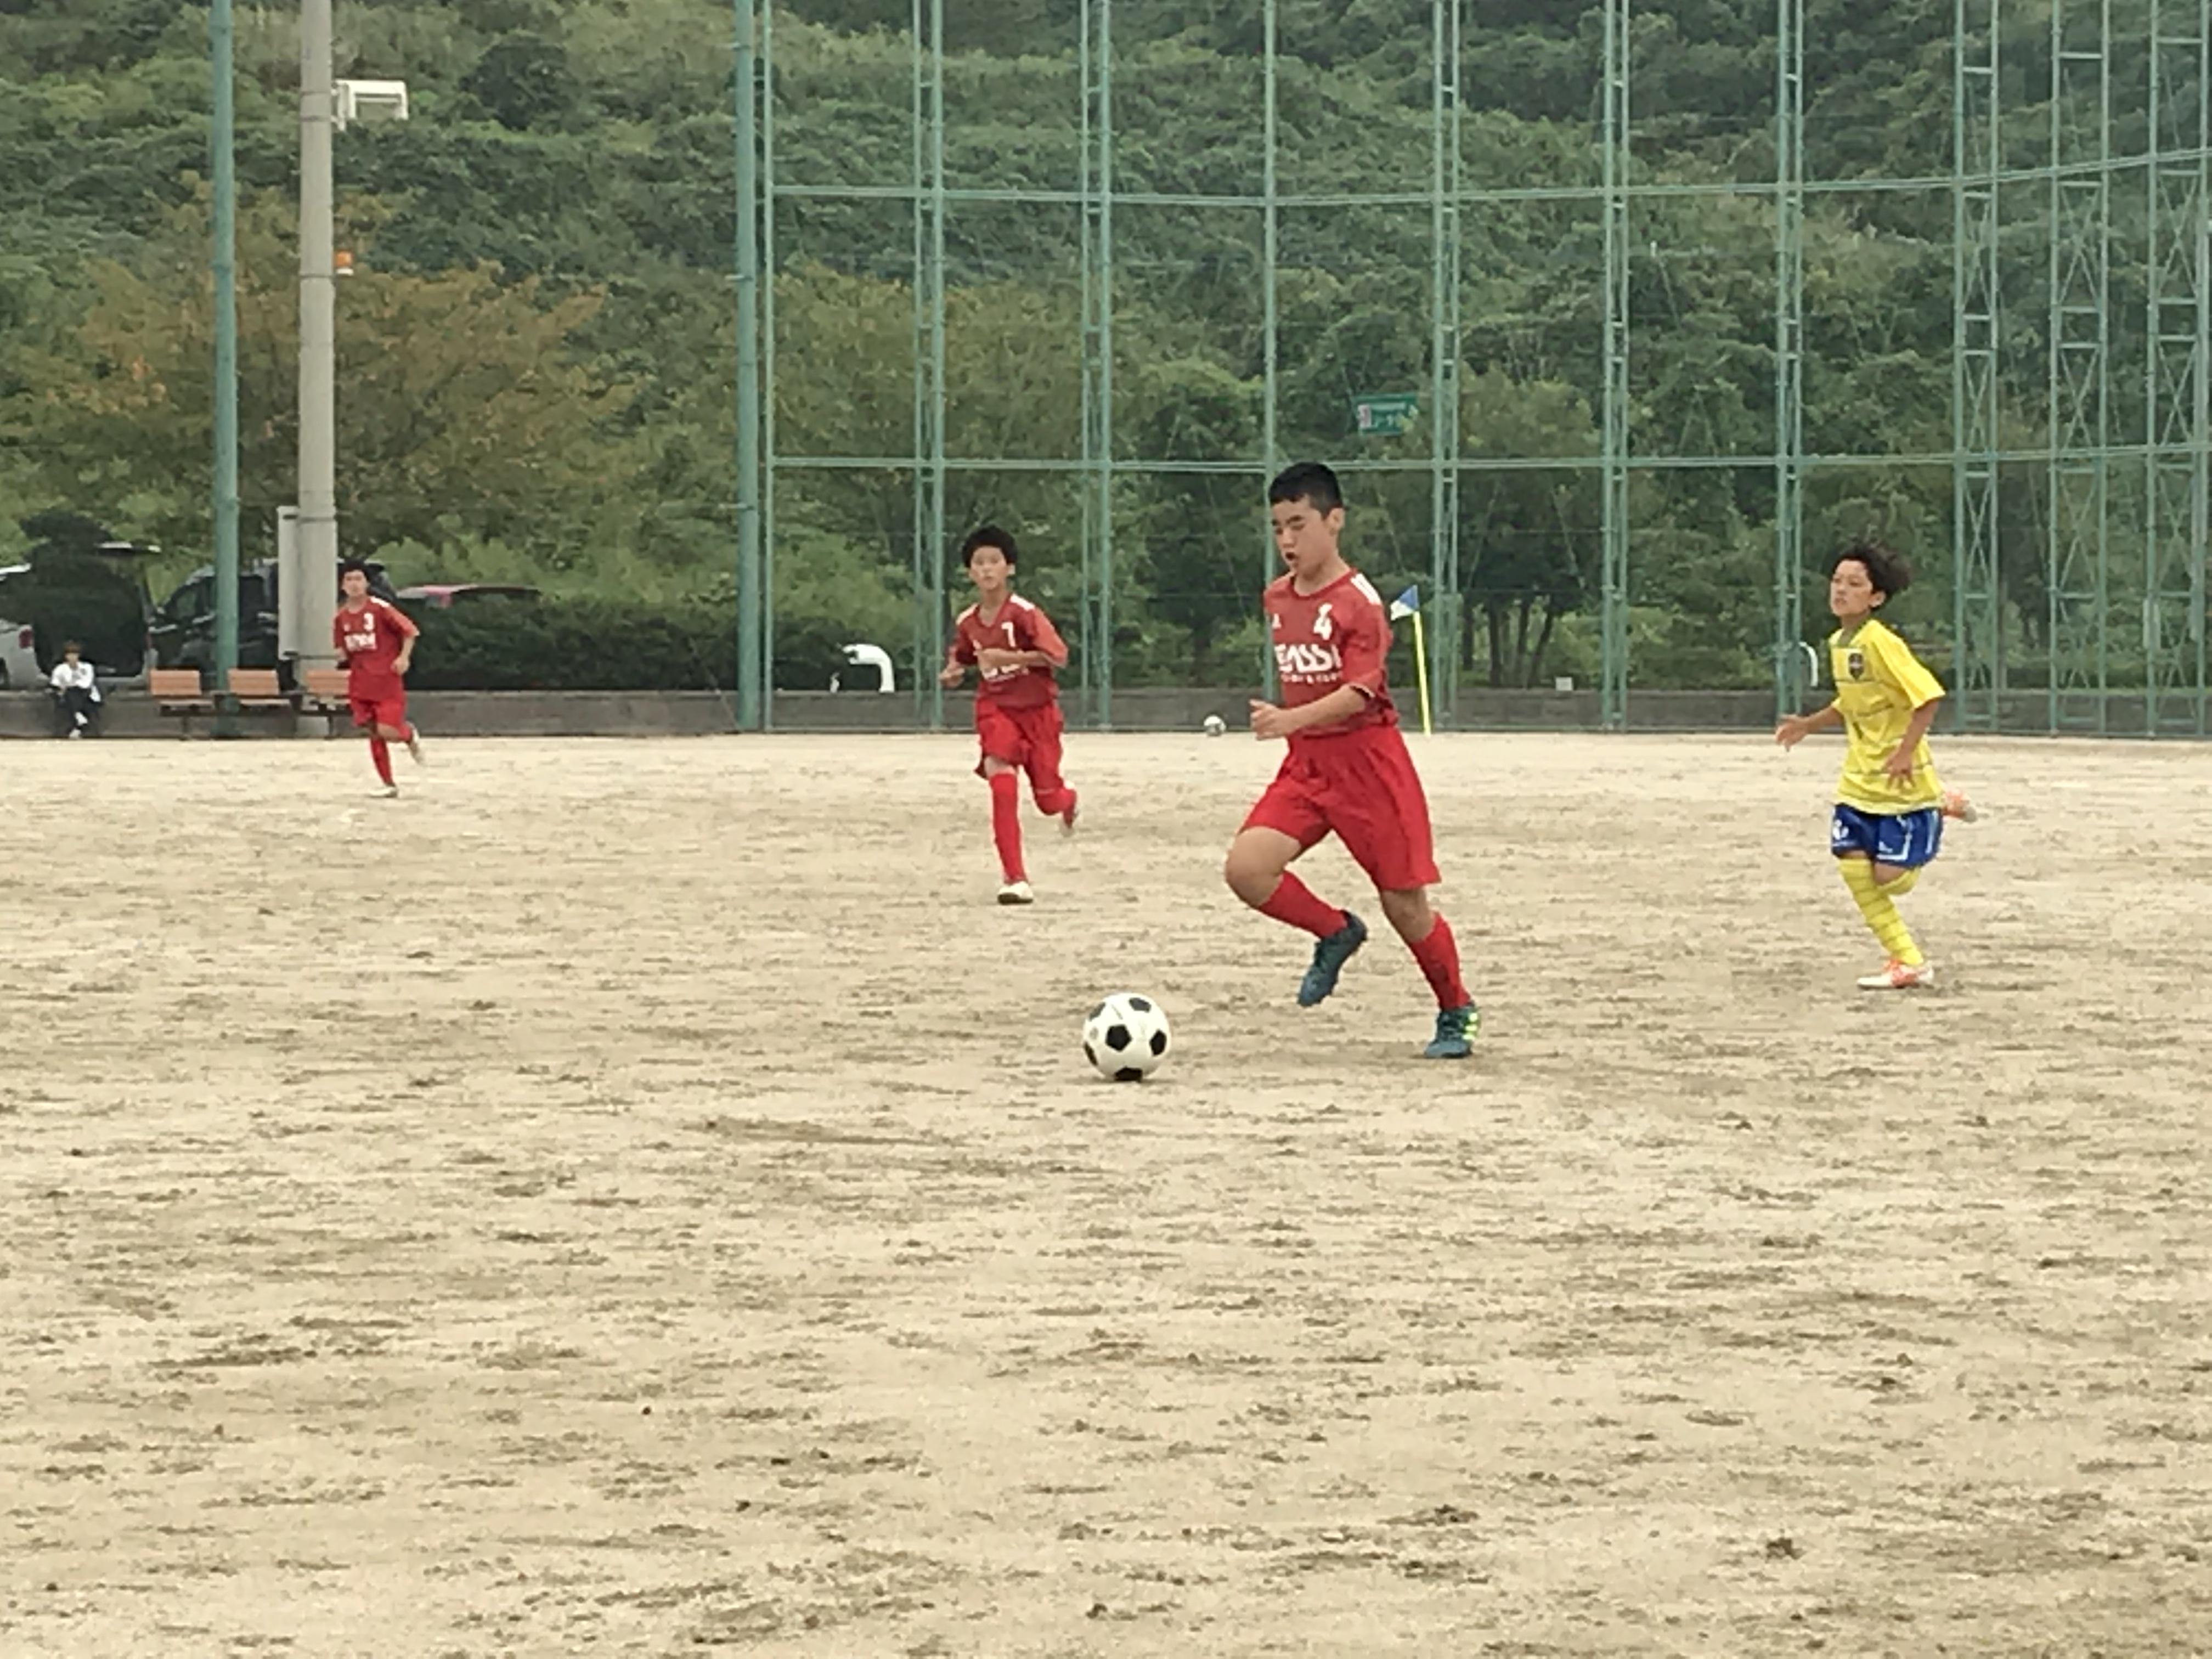 U13 Azul 後期上位県リーグ vs カメリア